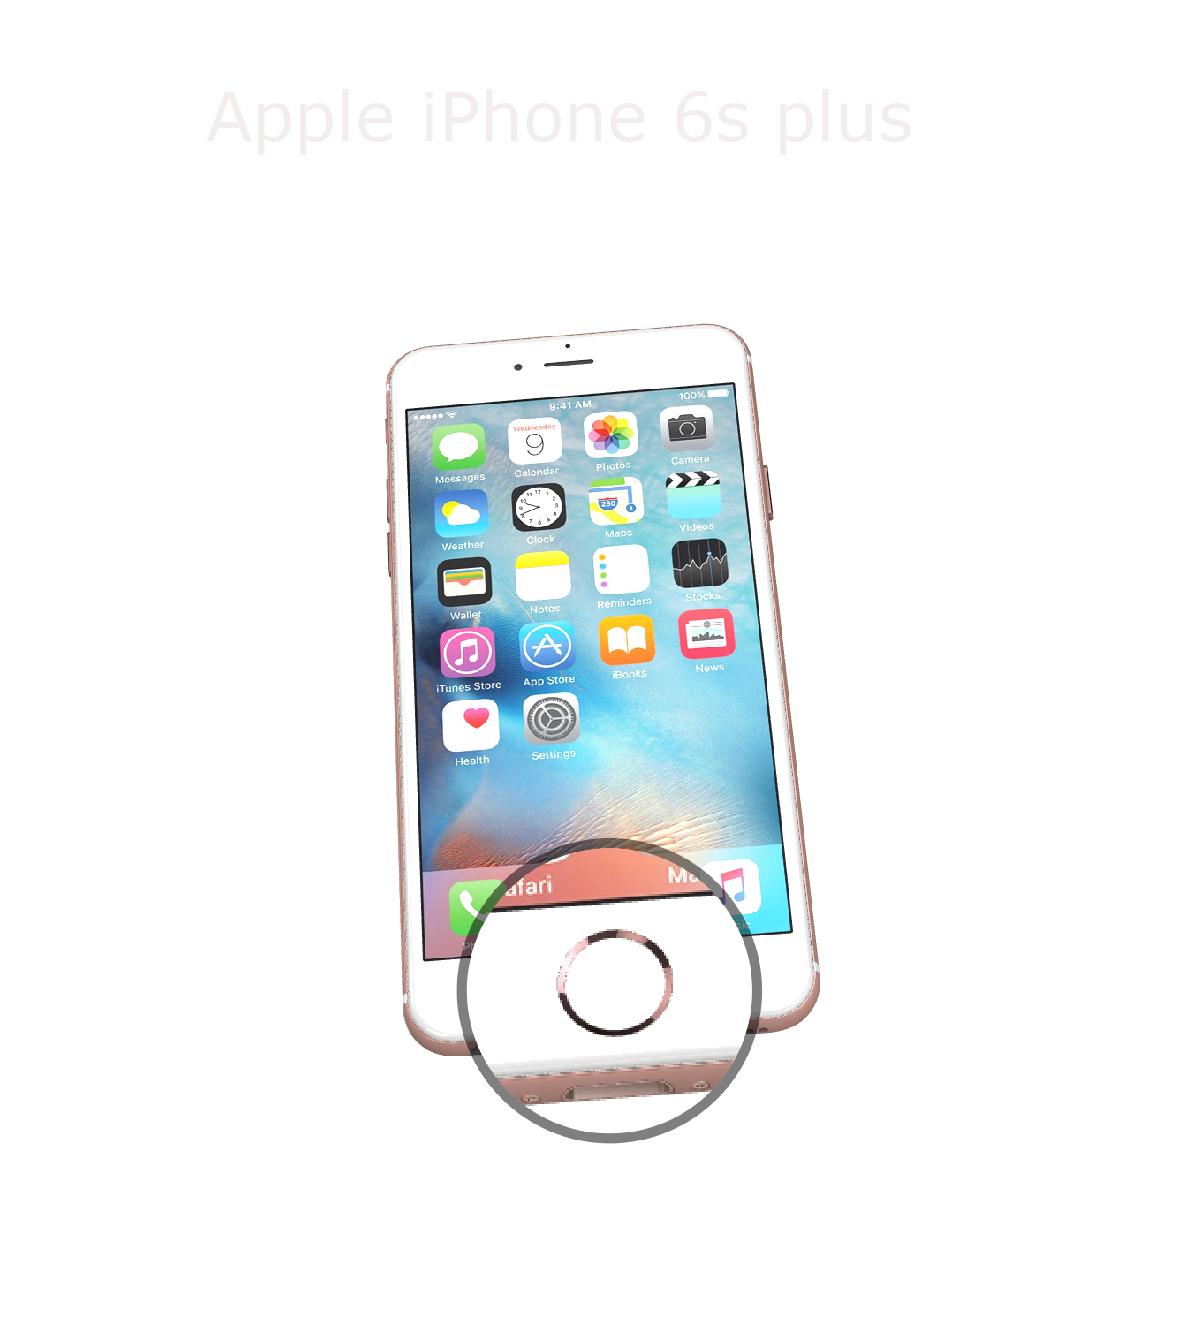 Laga hemknapp iPhone 6s plus